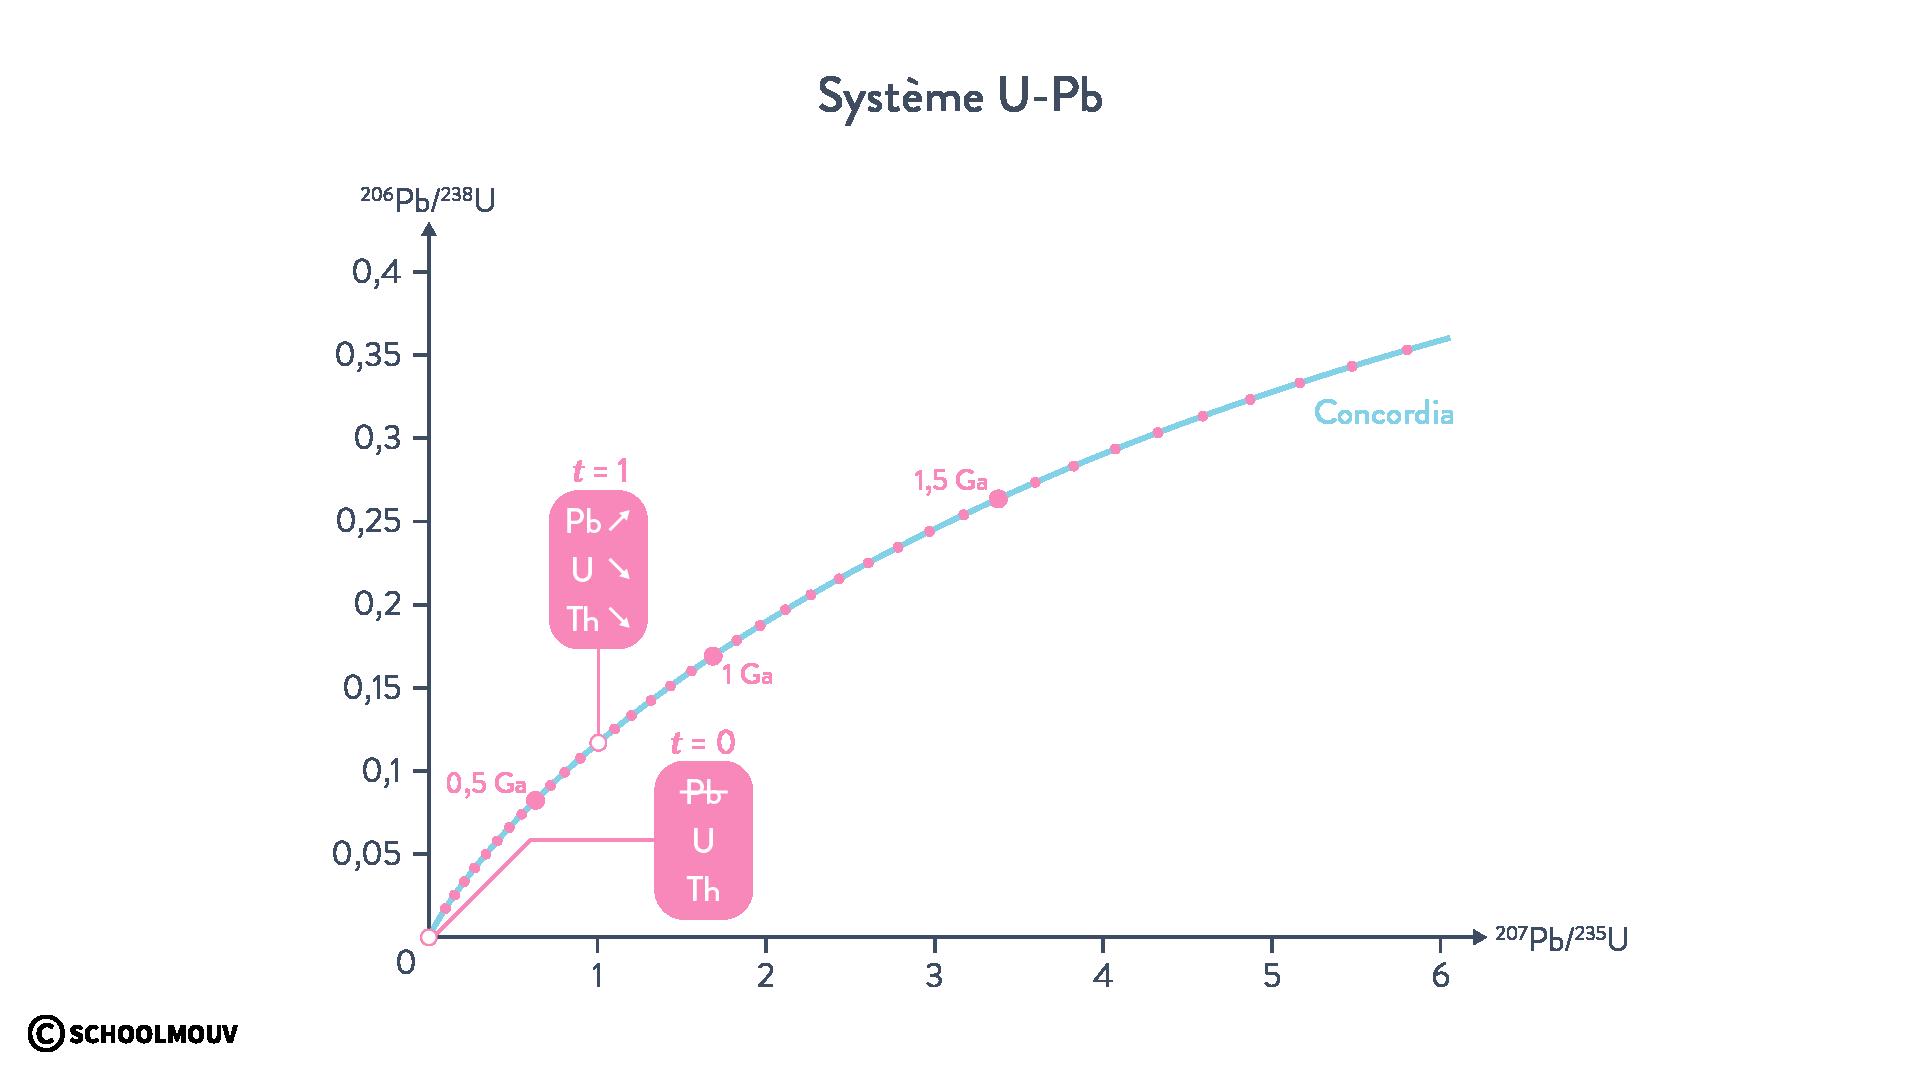 Système U-Pb